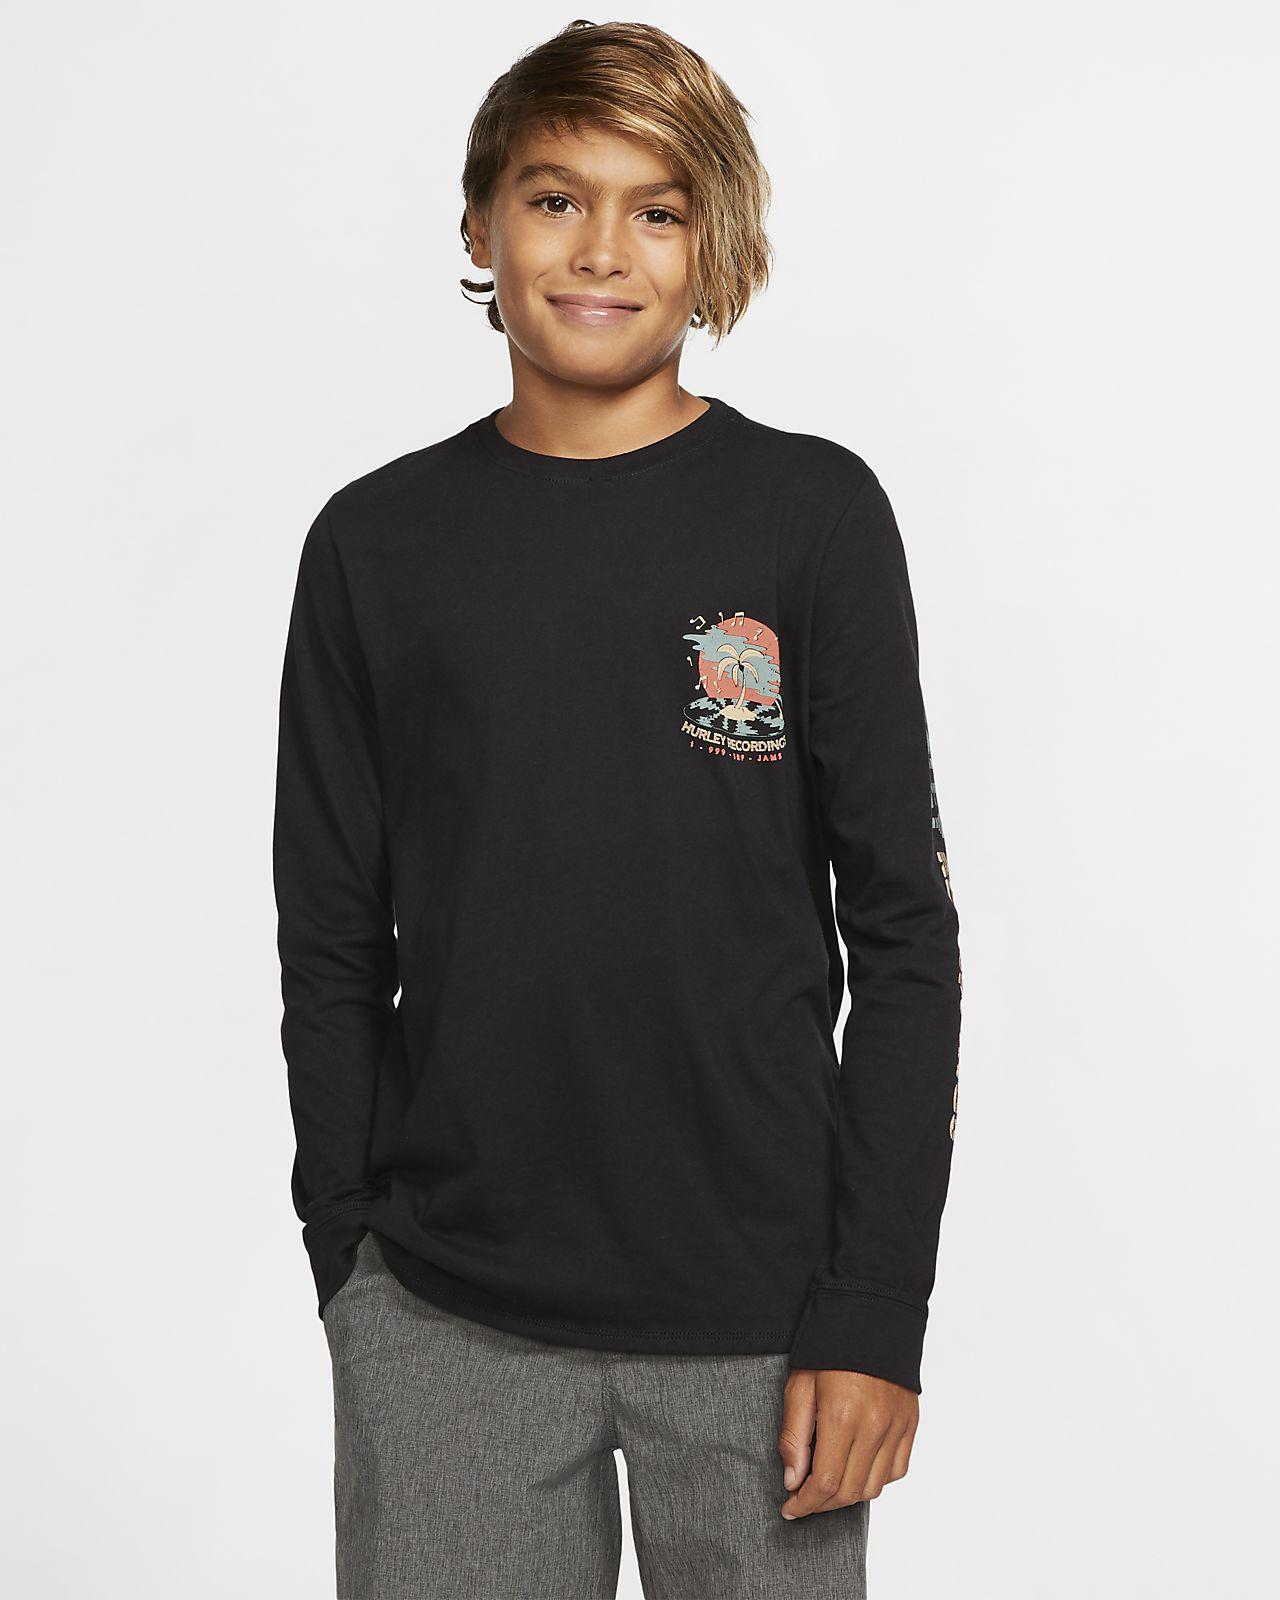 Hurley Premium Record Palms Boys' Long-Sleeve T-Shirt